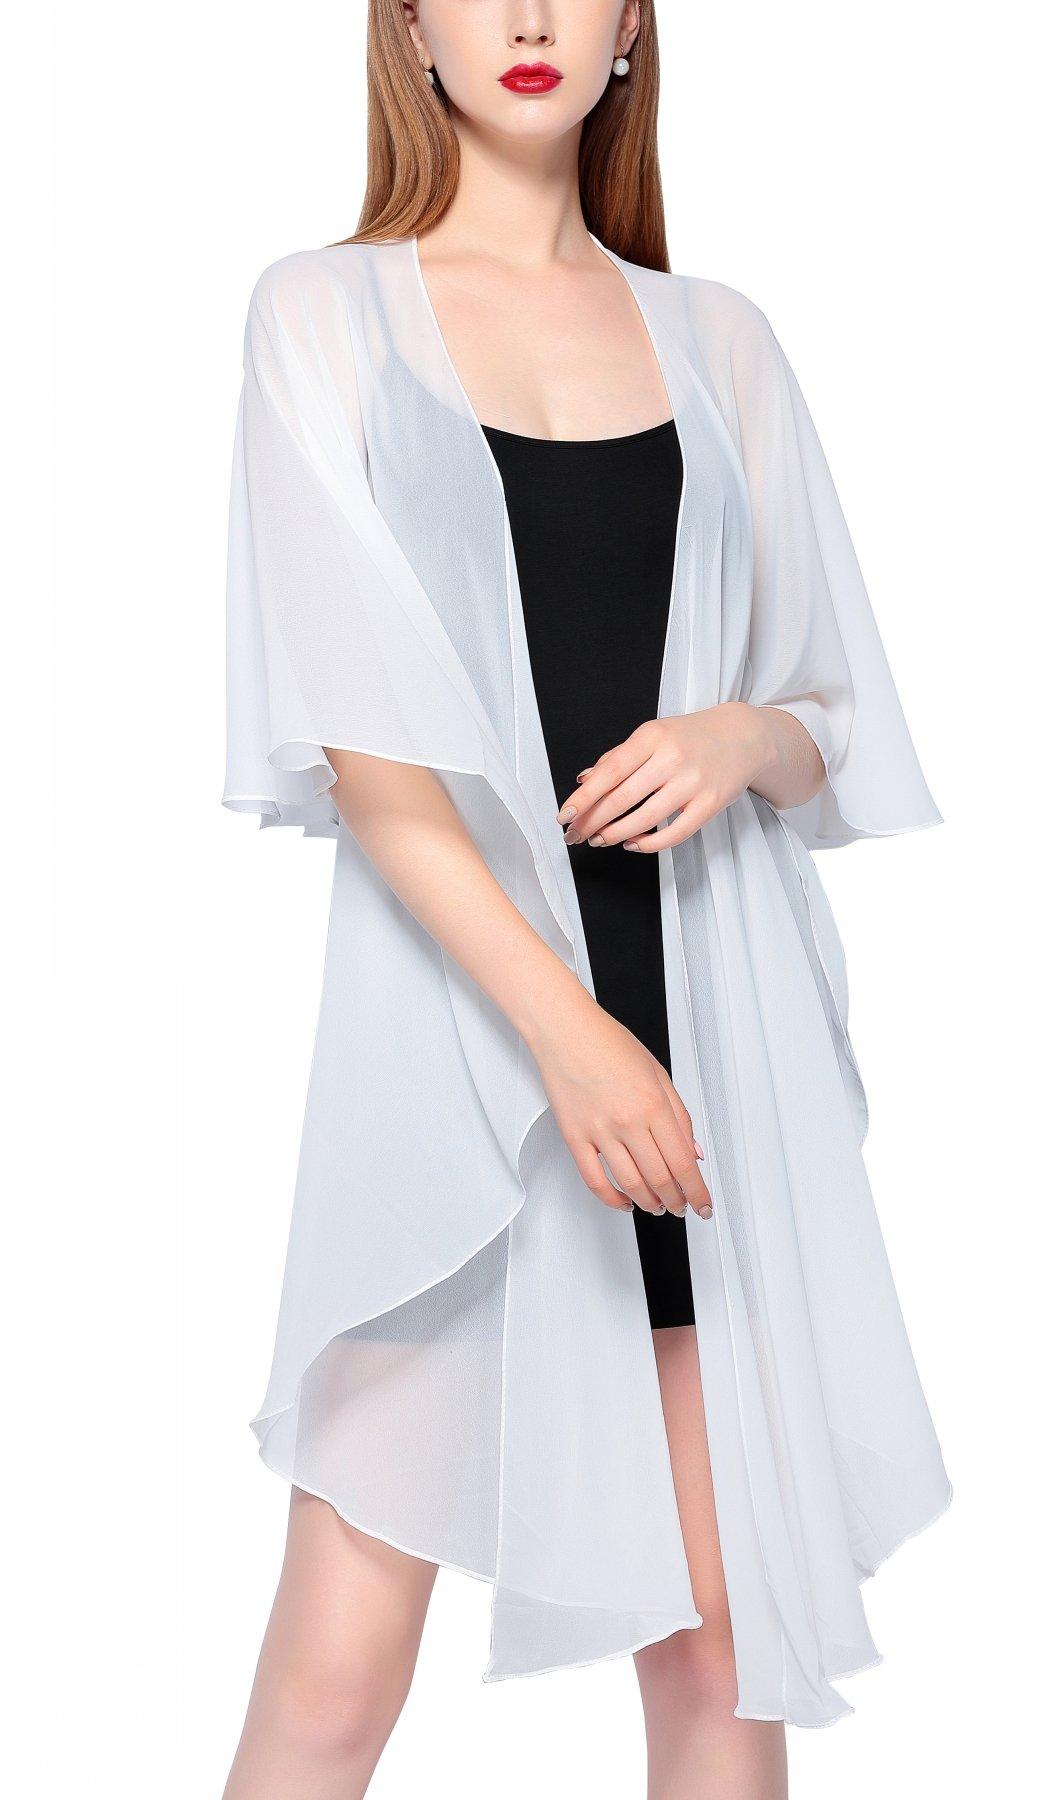 Chic Queen Women's Sheer Chiffon Bolero Shrug Jacket Cardigan Long Sleeve (L, Style-2 Ivory)